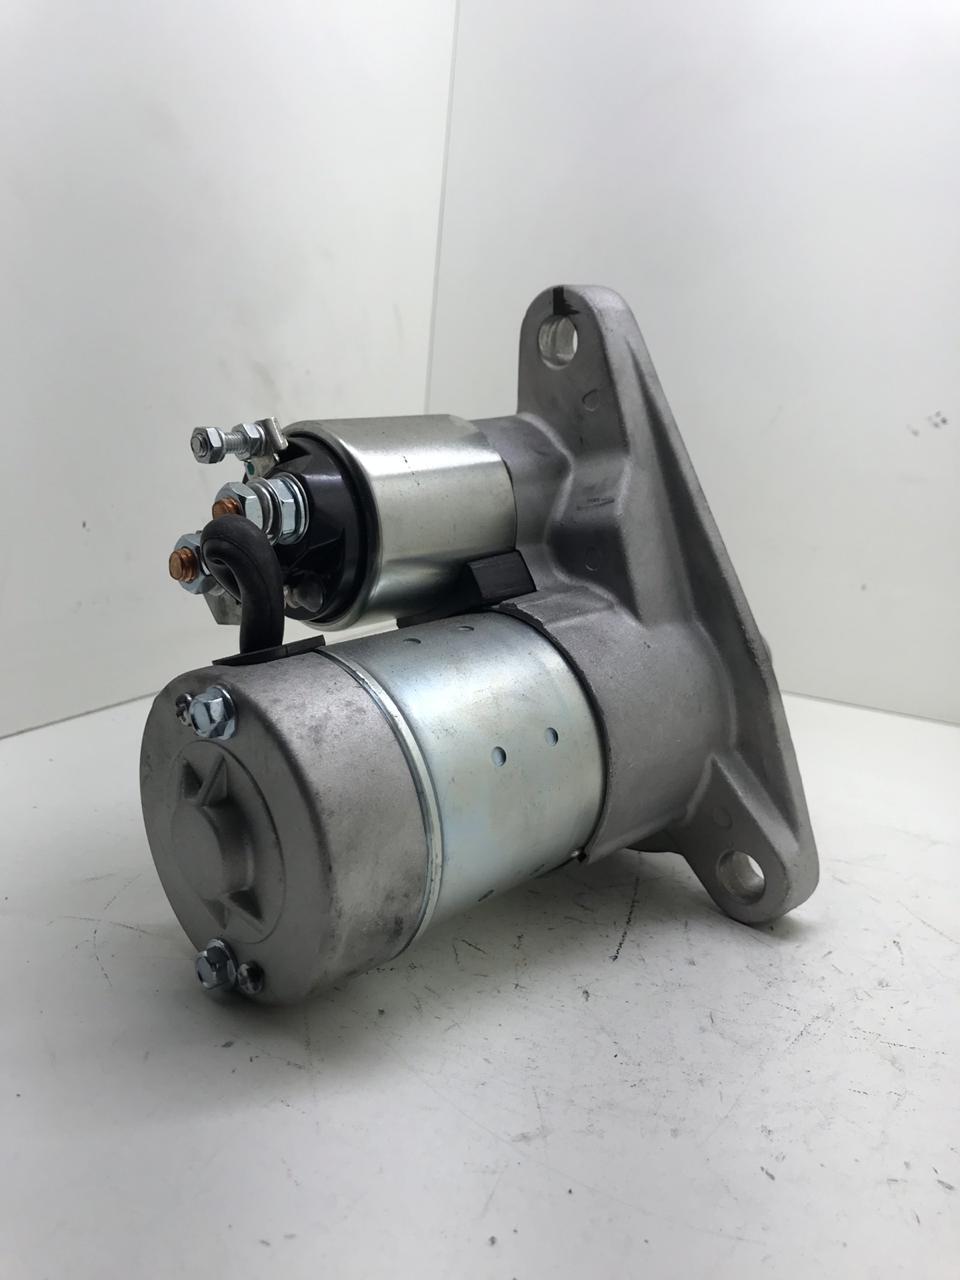 Motor de arranque NISSAN Sentra Versa Tiida RENAULT Fluence HITACHI 12V 10 D S114902 A B 23300EN200R  23300EN20B  17982 20591 AEC11061